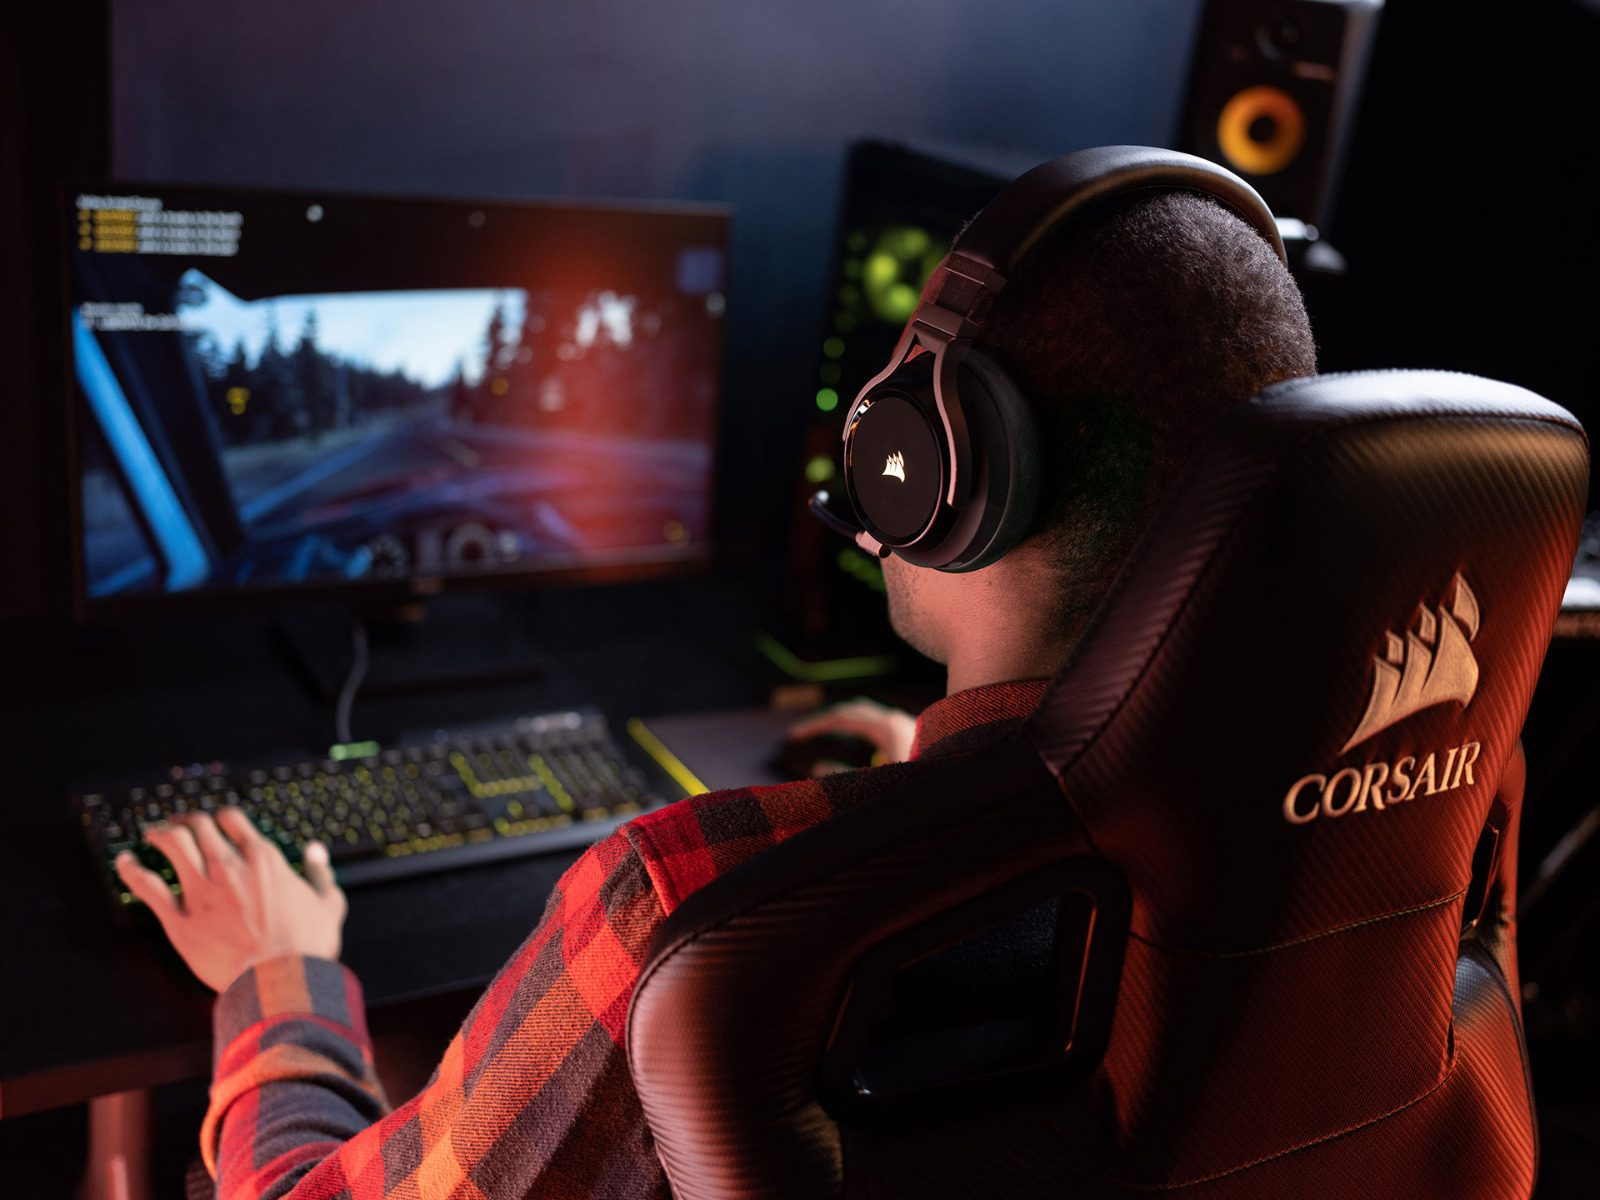 3 corsair virtuoso rgb siyah kablosuz gaming kulaklik 5285 - Corsair Virtuoso RGB Siyah Kablosuz Gaming Kulaklık